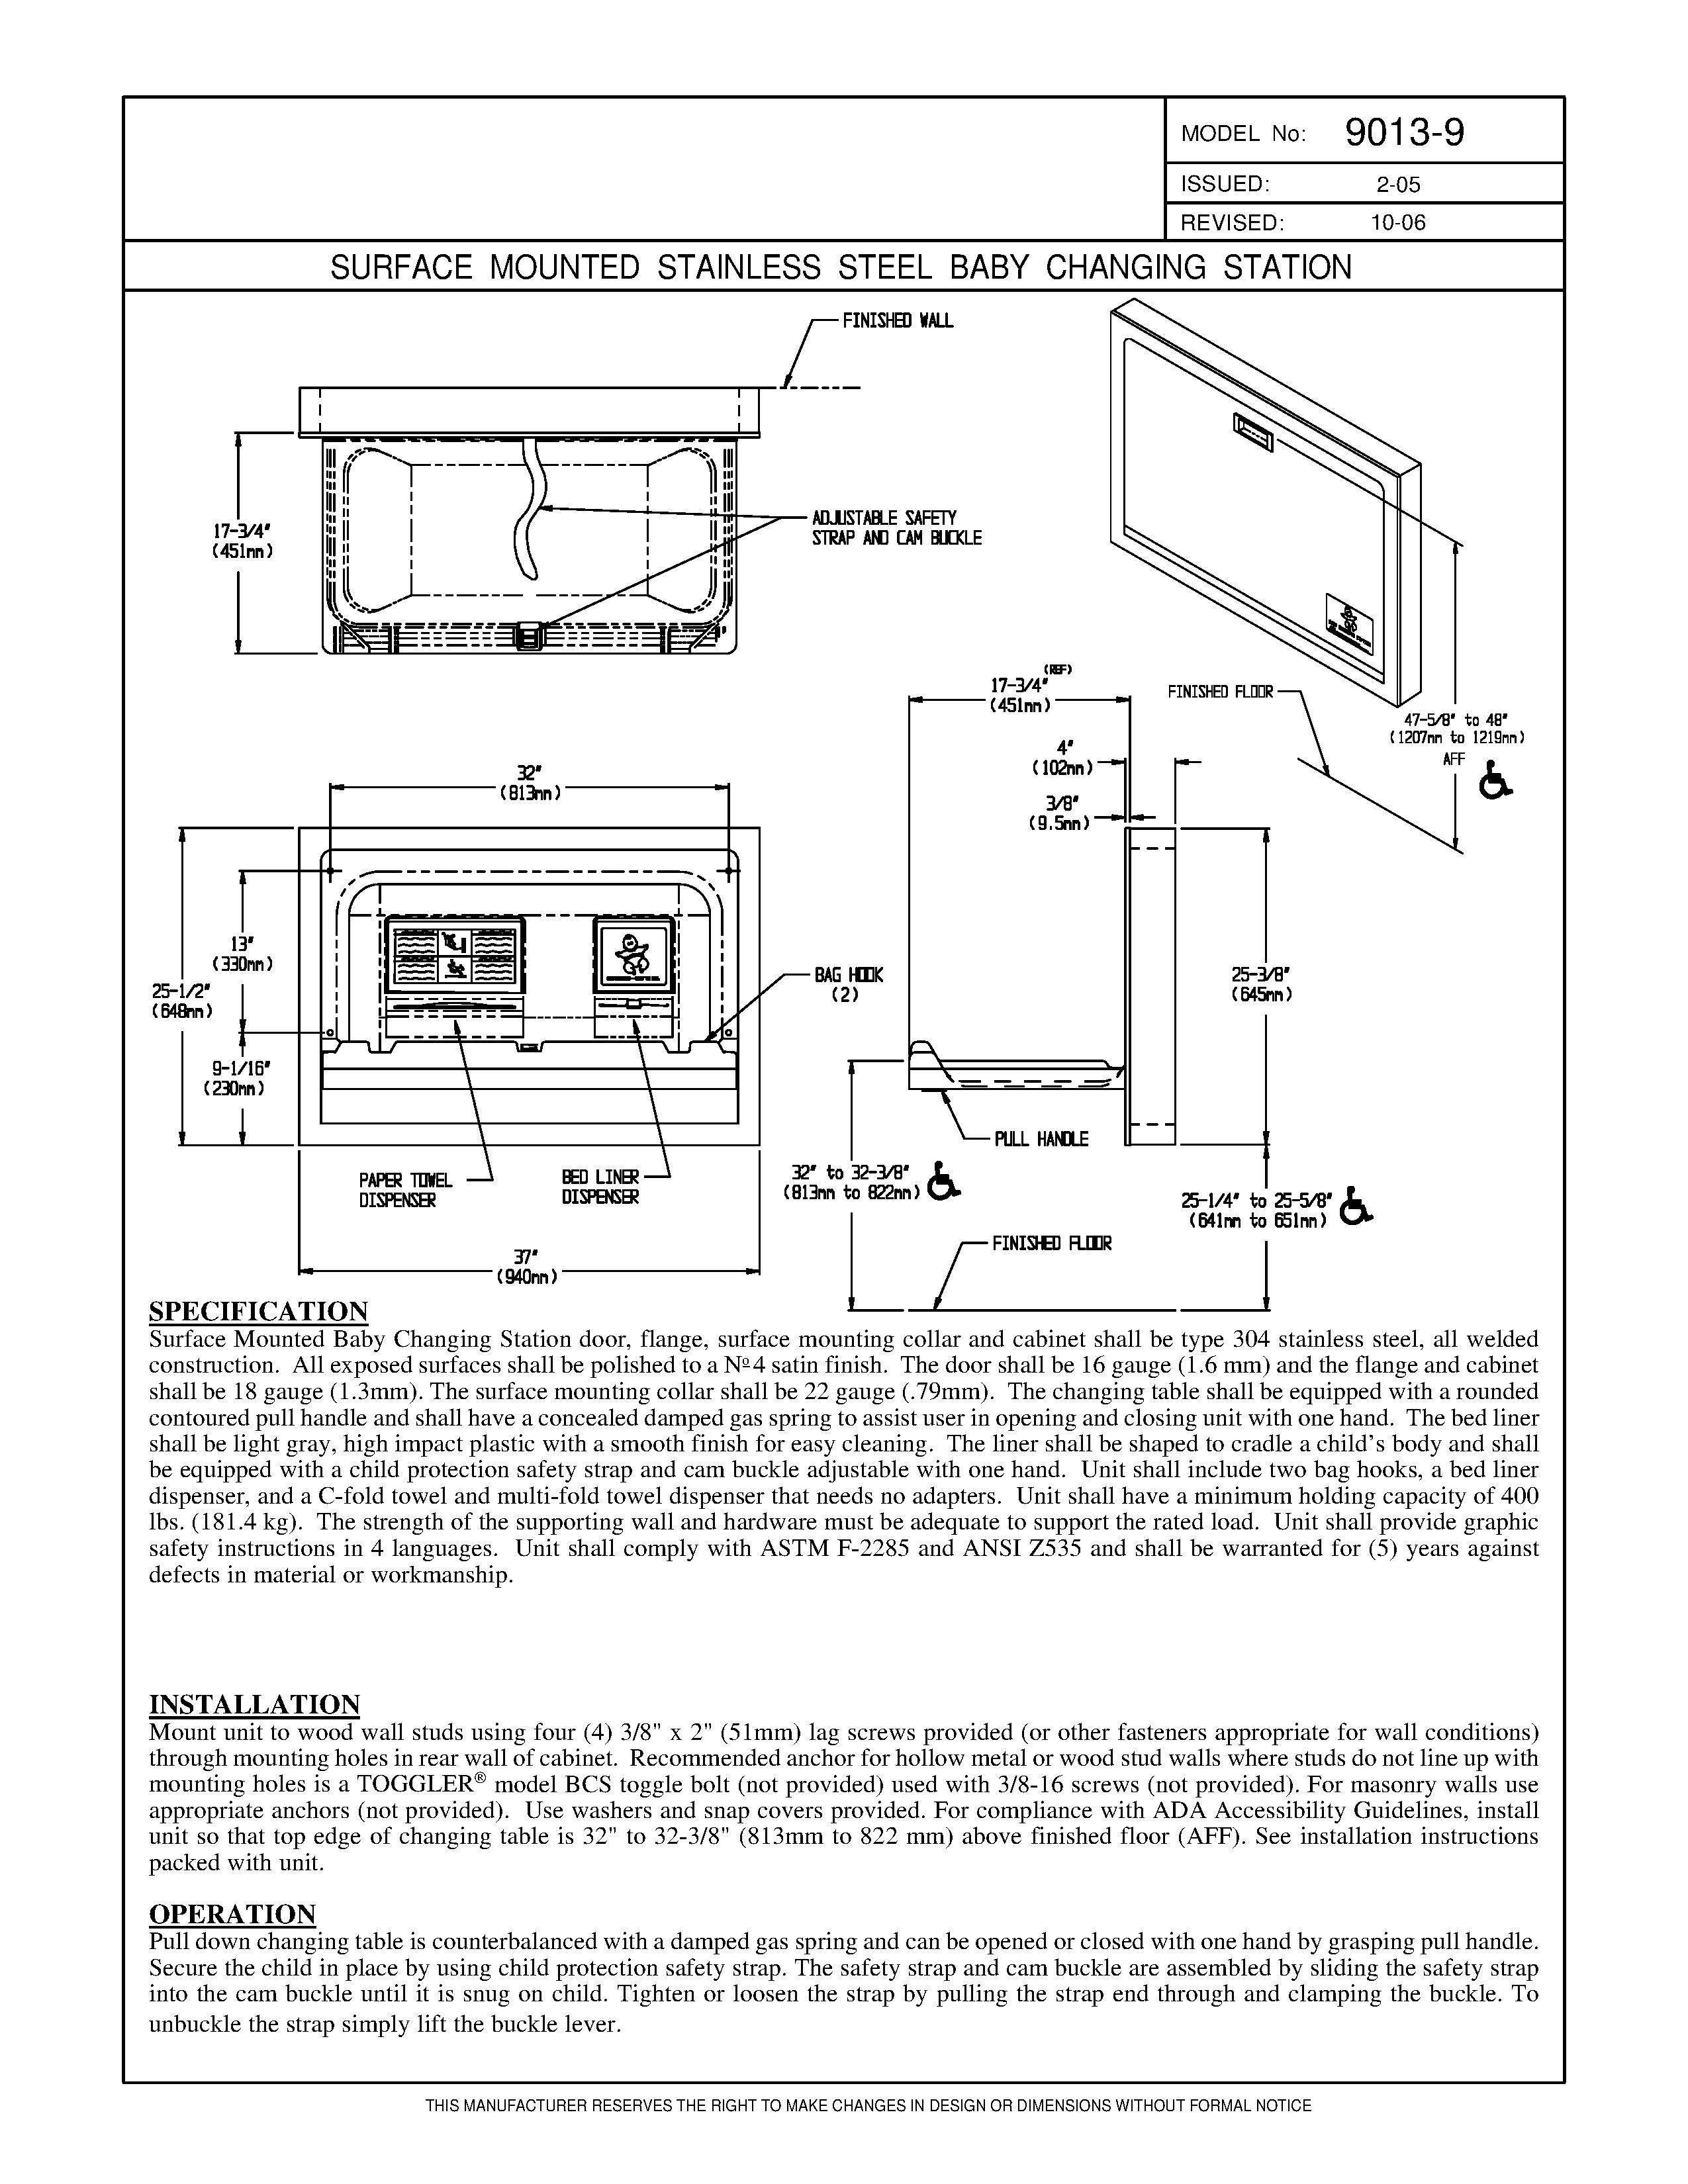 Asi 9013 9 Baby Changing Station Surface Mounted